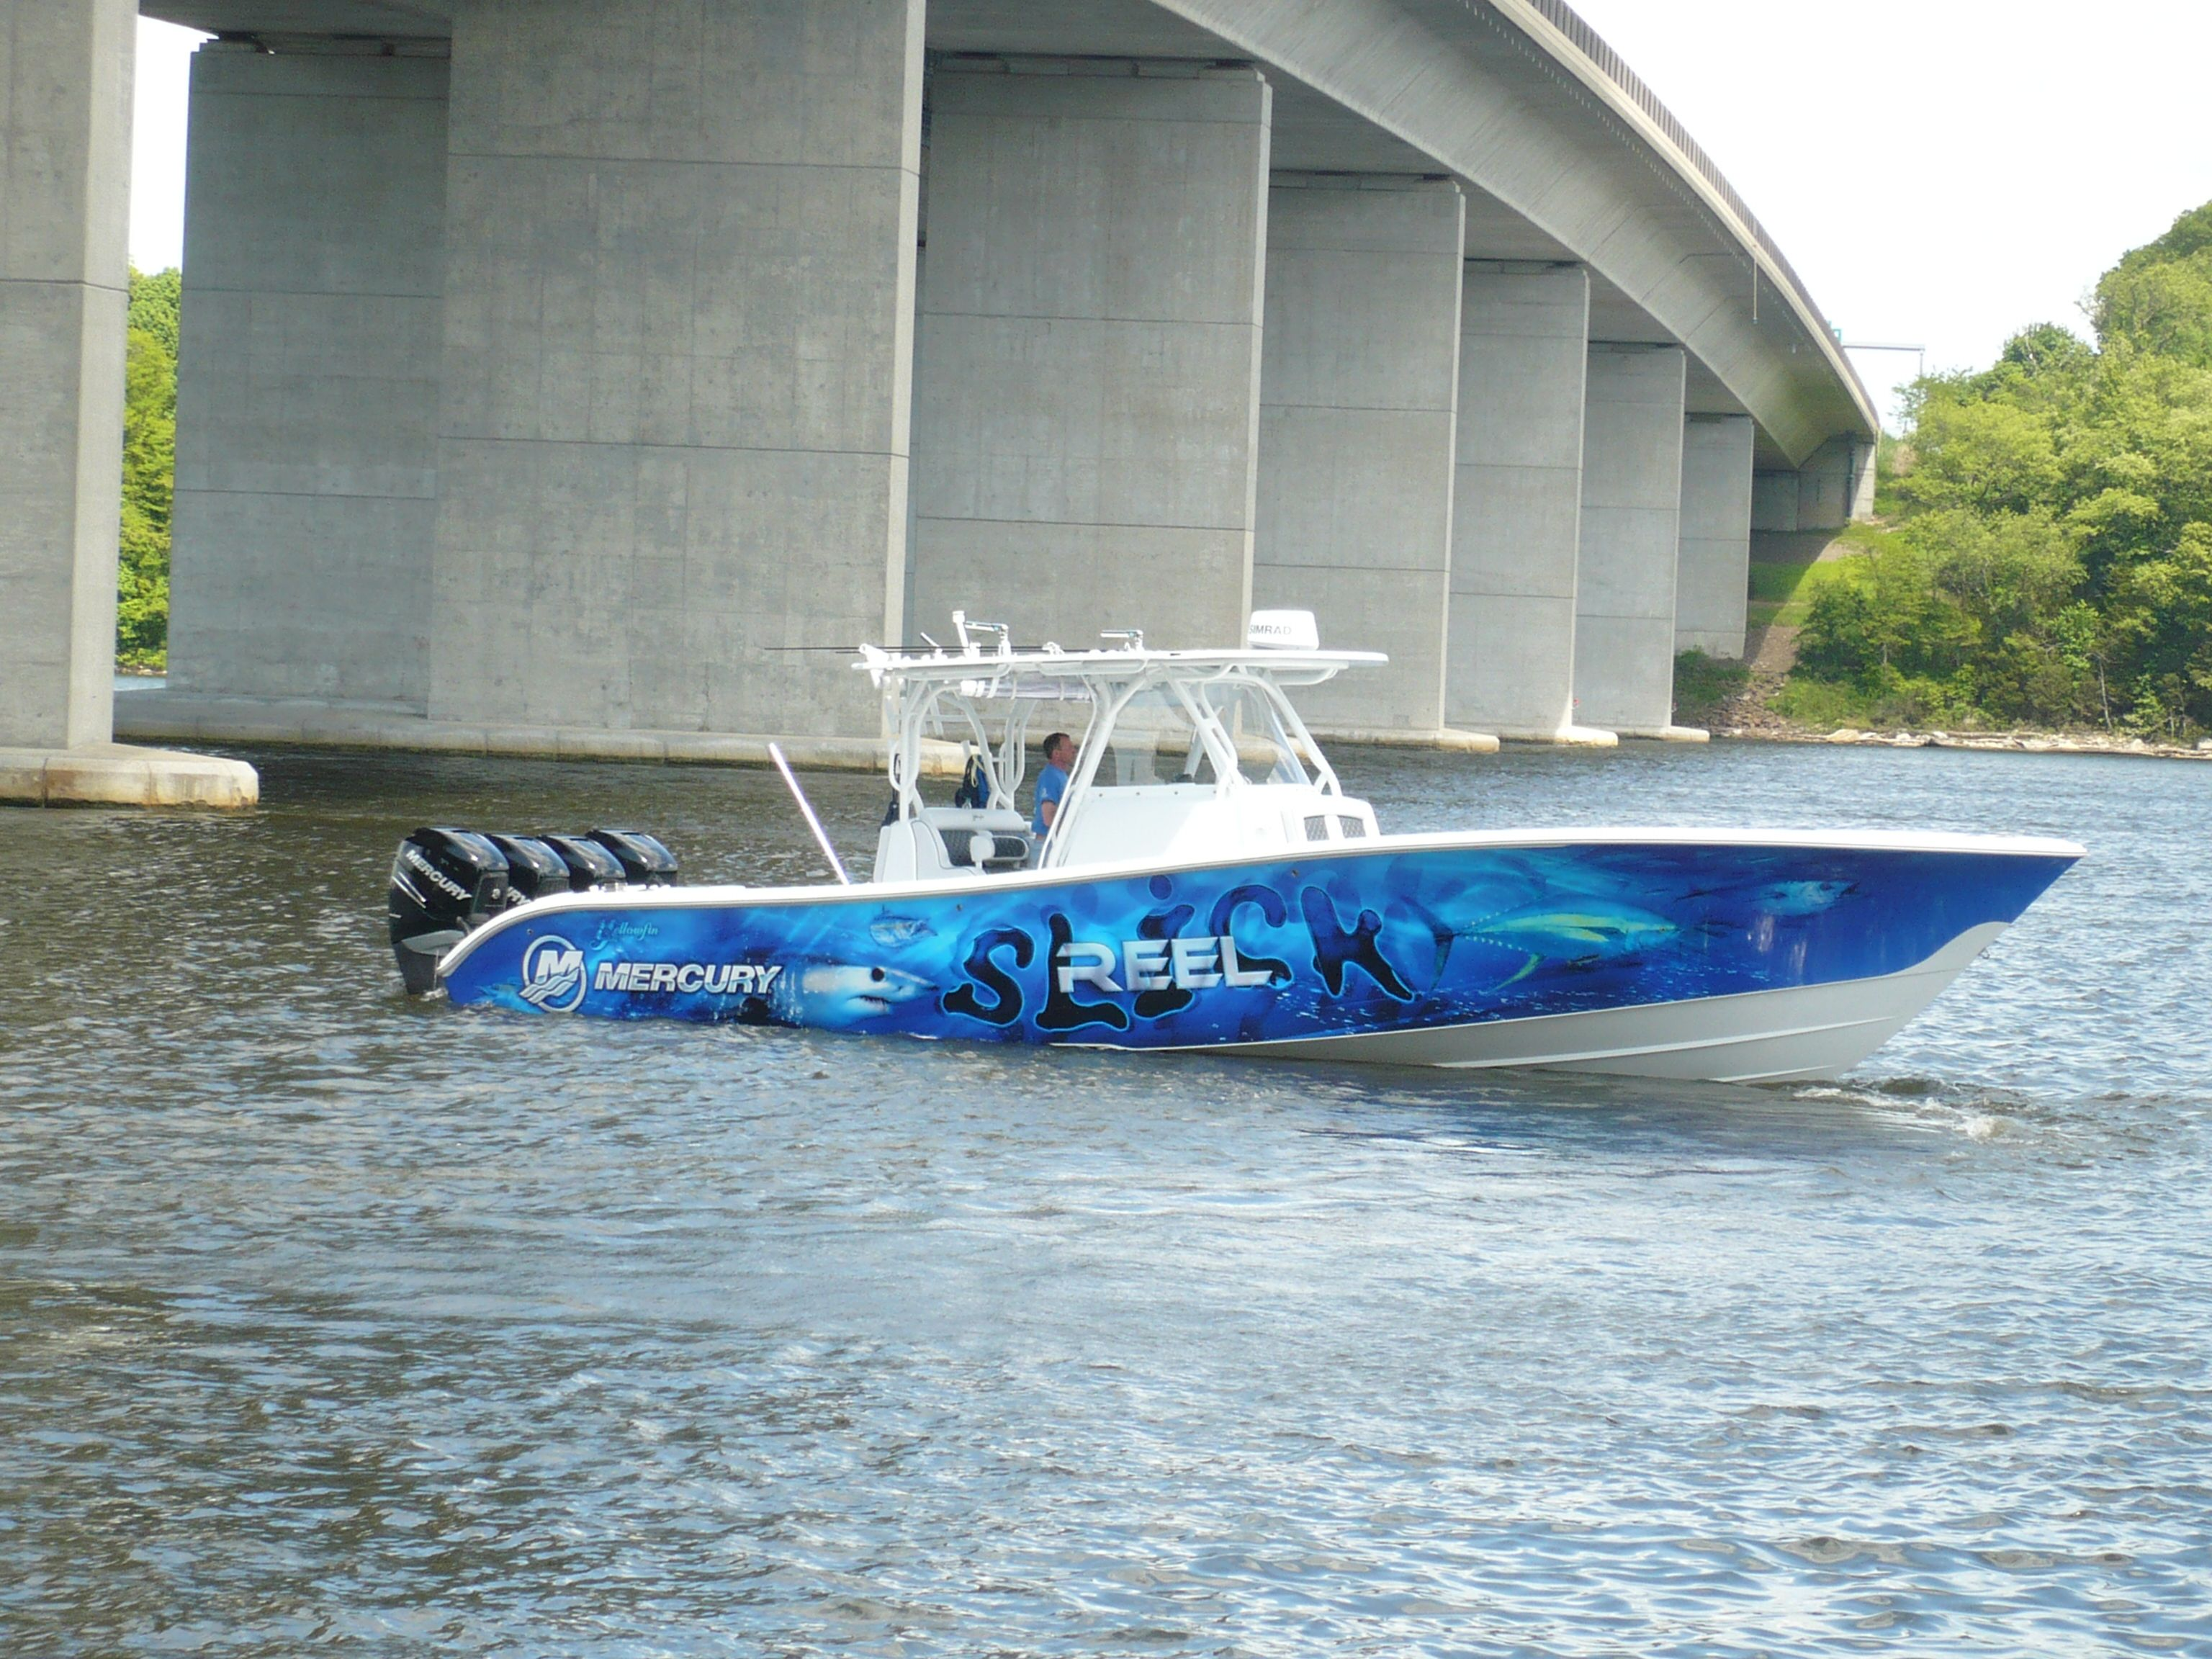 Reel Slick Boat NamesMotor